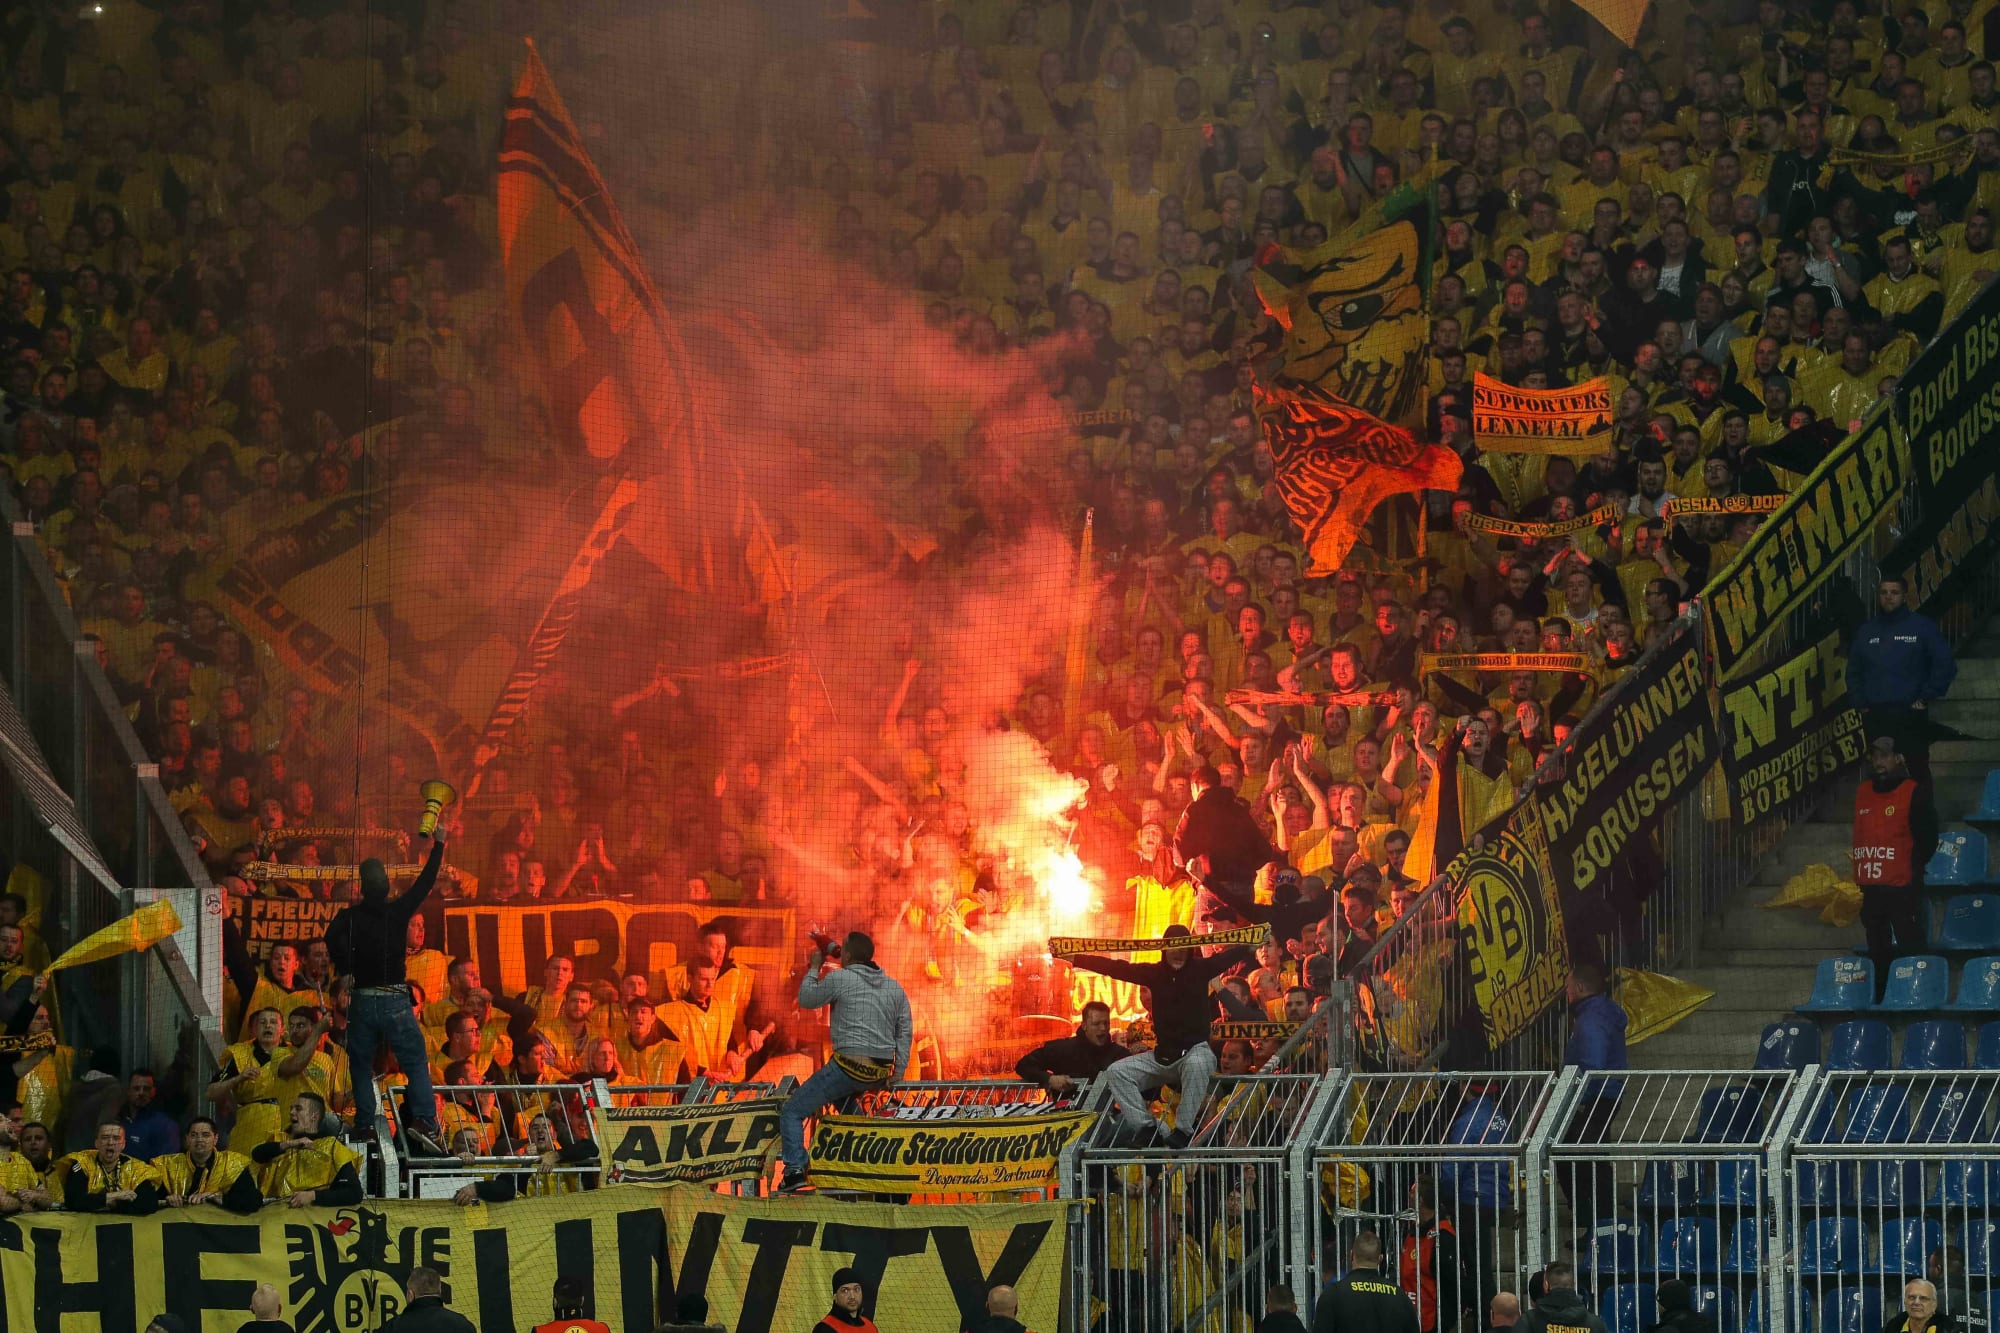 German Fa Opens Investigation Against Borussia Dortmund Magdeburg